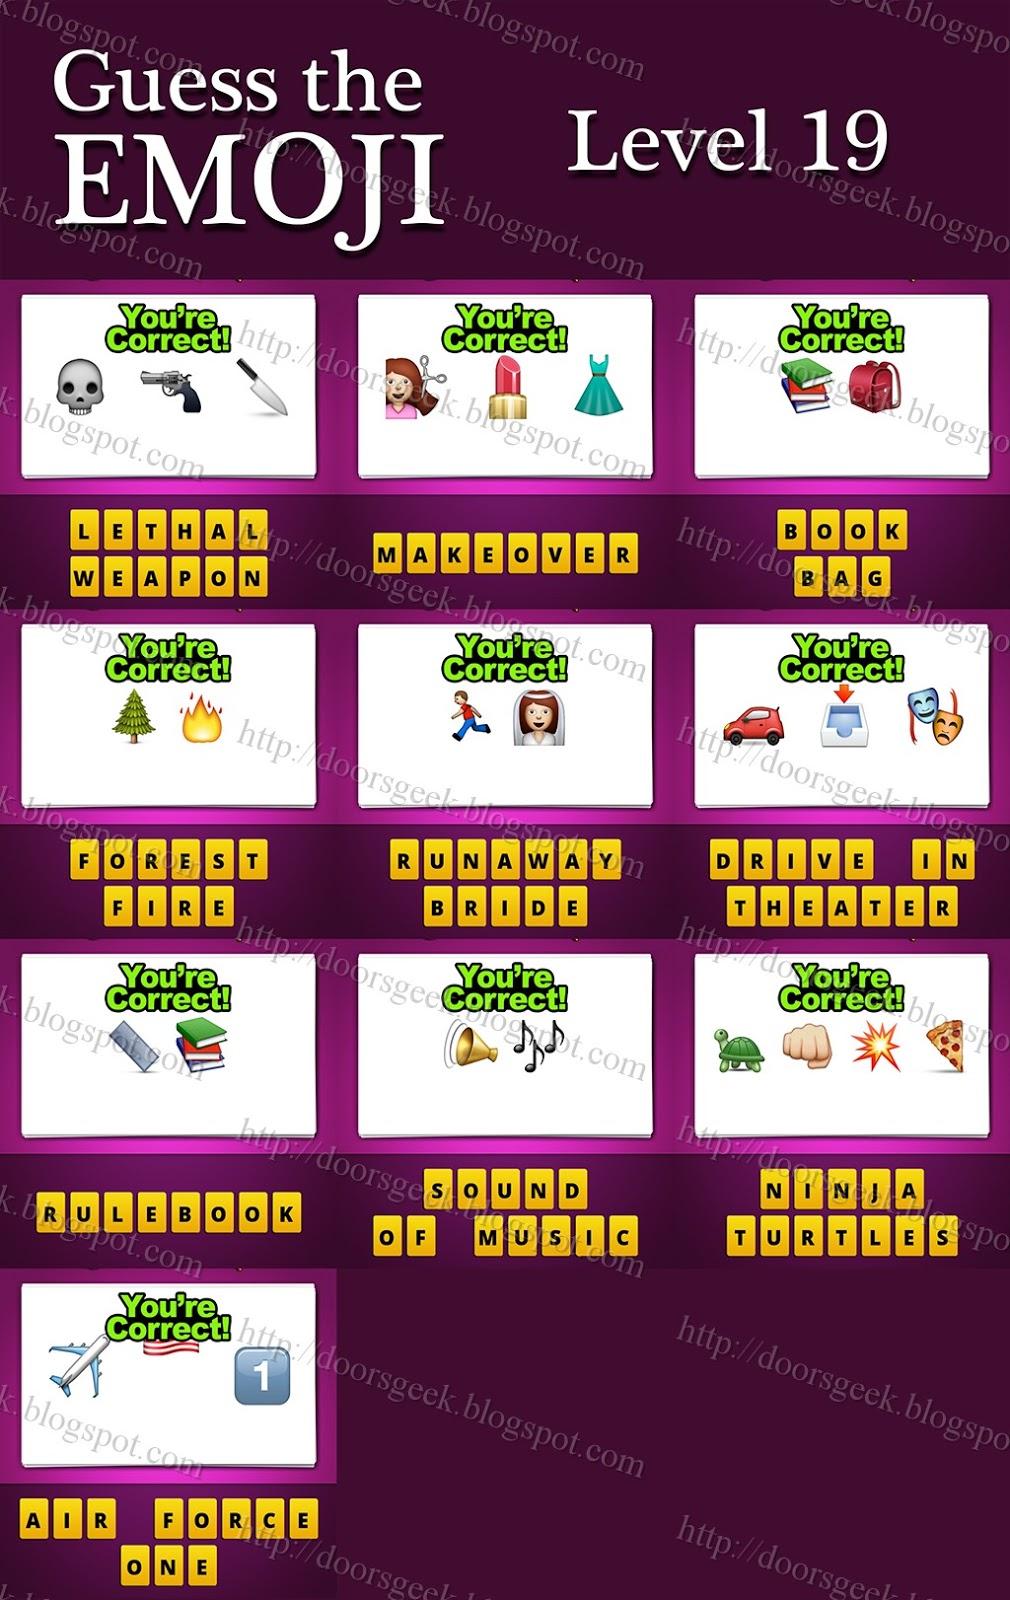 Emoji quiz level 14 celebrity guess